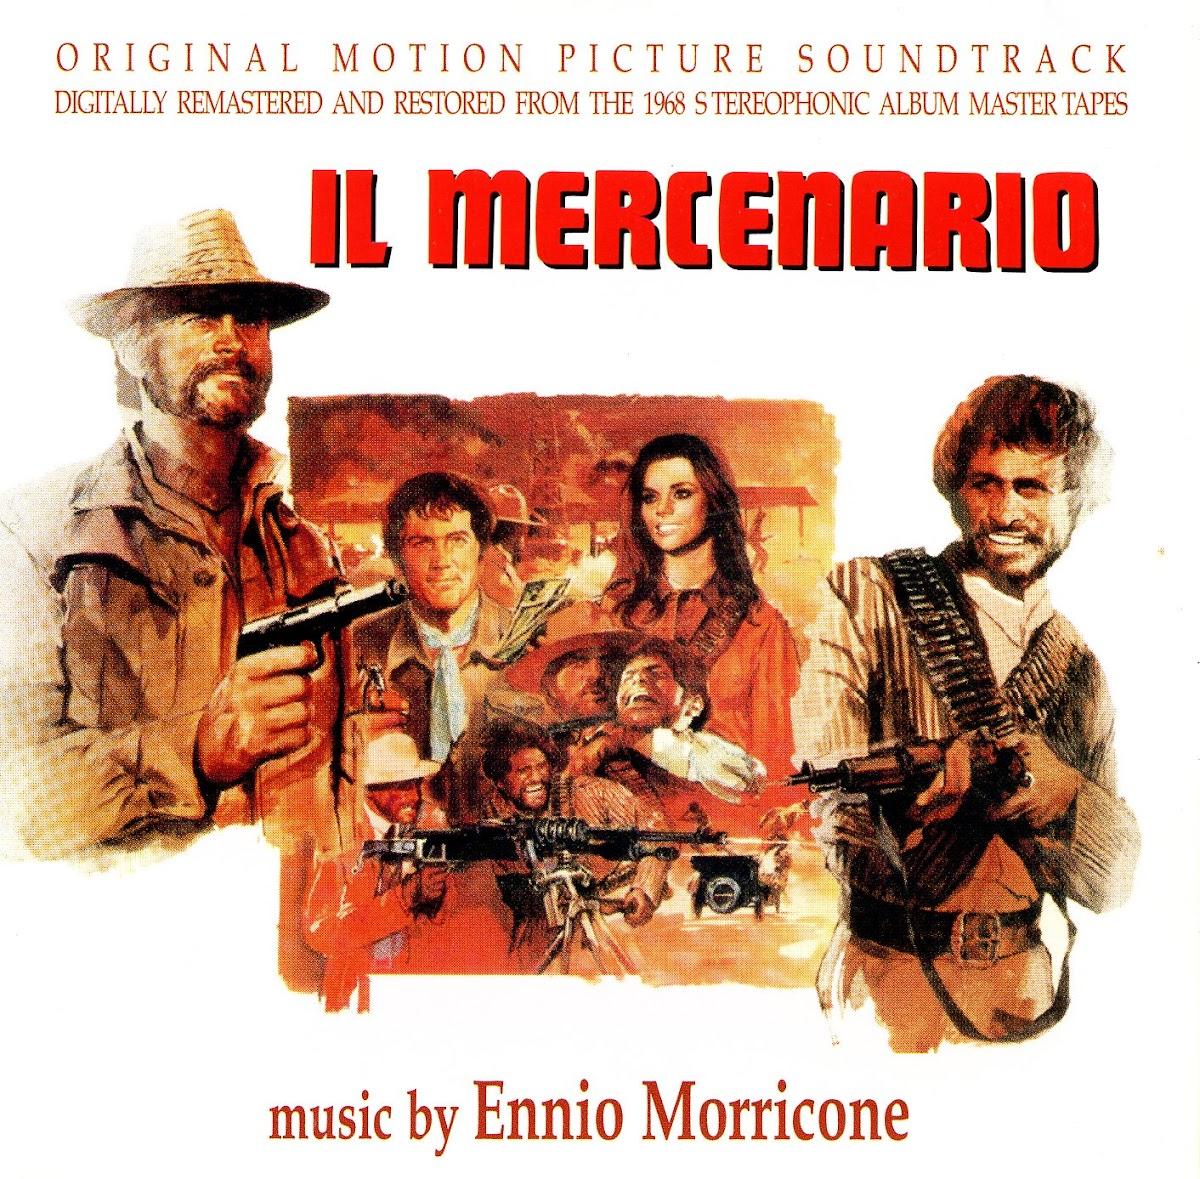 http://2.bp.blogspot.com/_YGmysIzCkn0/TD54zacMk_I/AAAAAAAALf8/MEiuTgHevCw/s1200/Il+Mercenario+Front+001.jpg